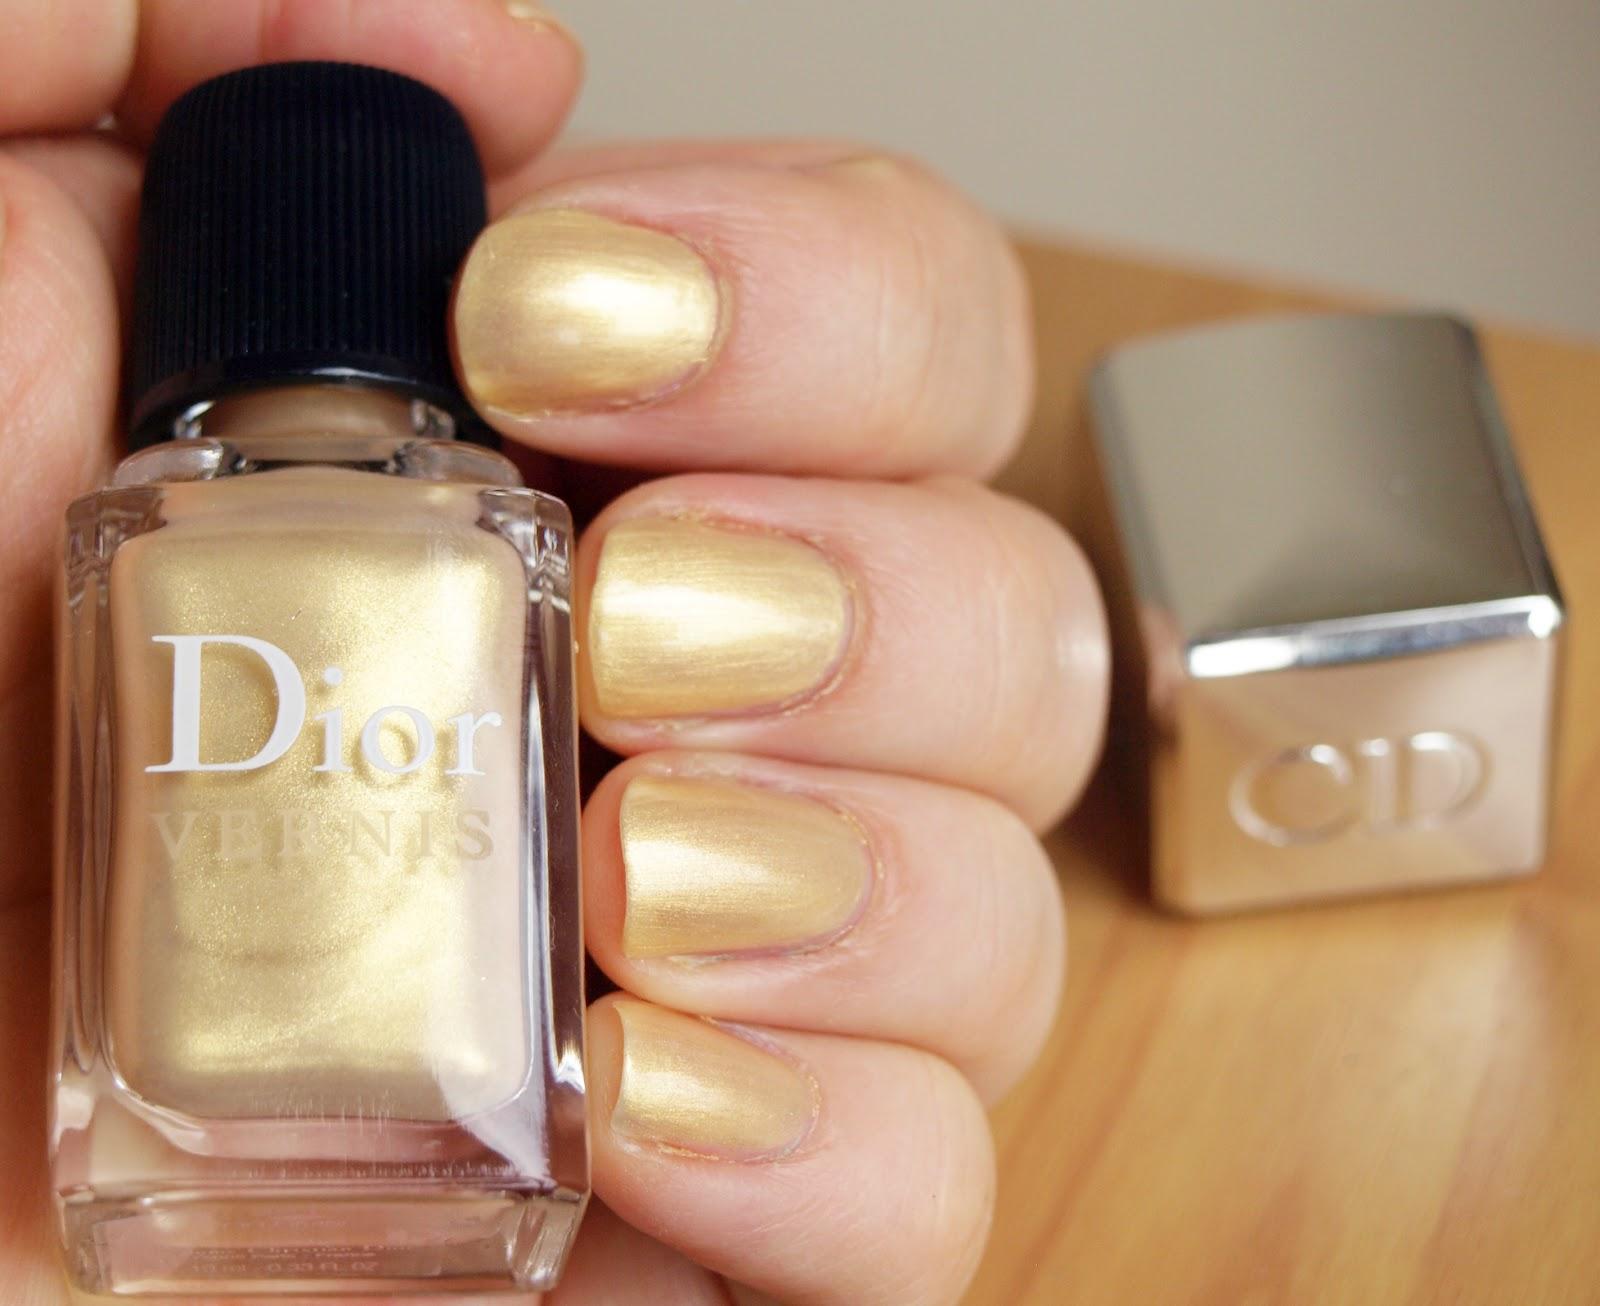 The Black Pearl Blog - UK beauty, fashion and lifestyle blog: NOTD ...